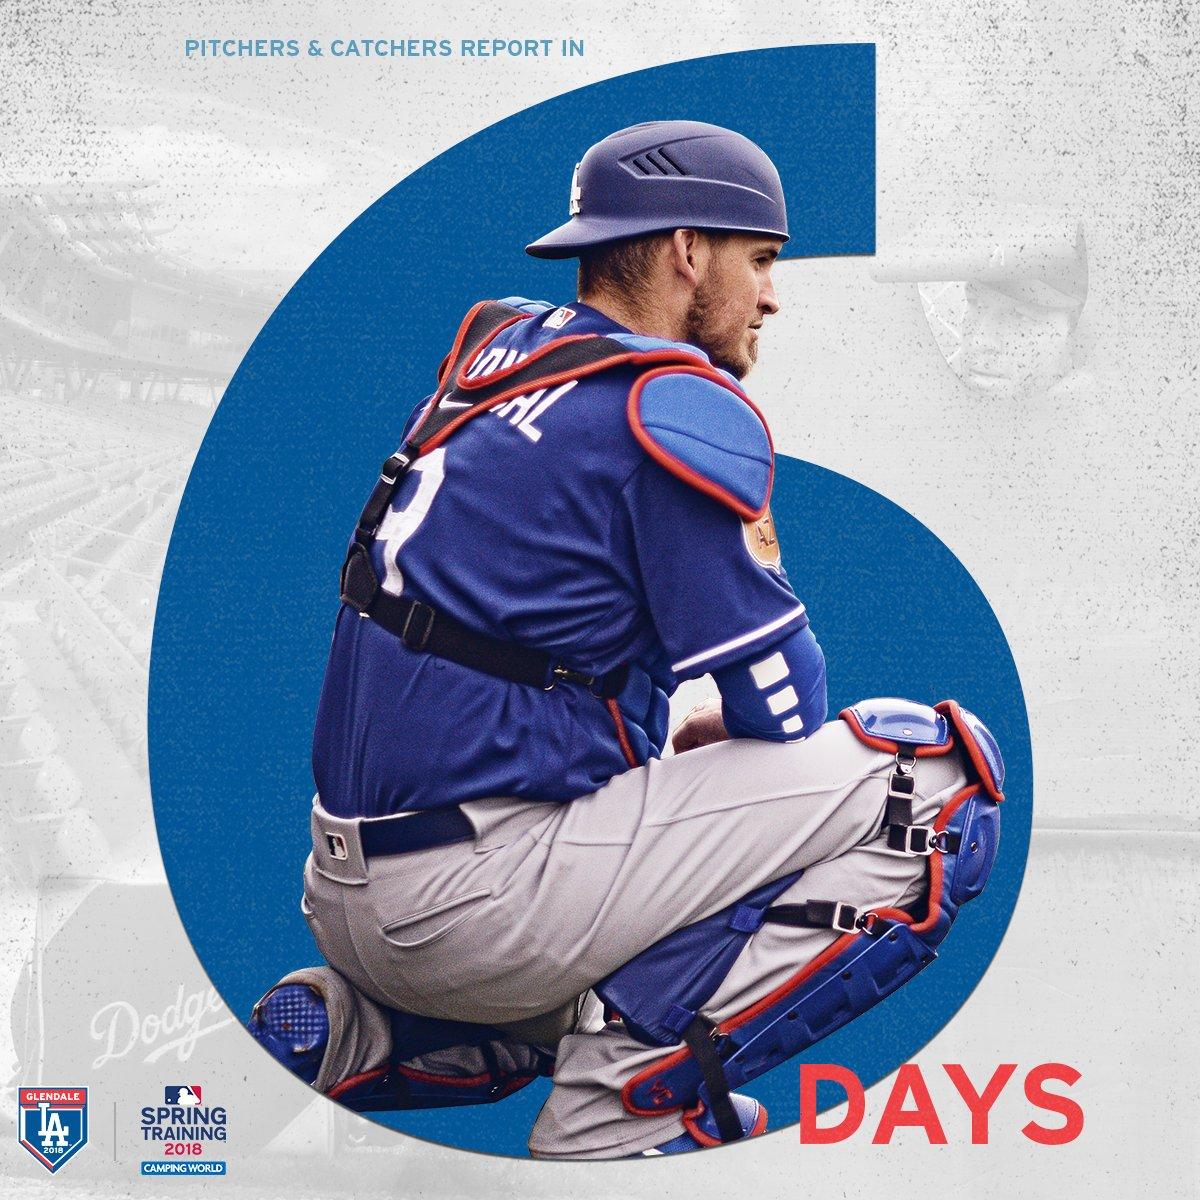 Six more days. #DodgersST